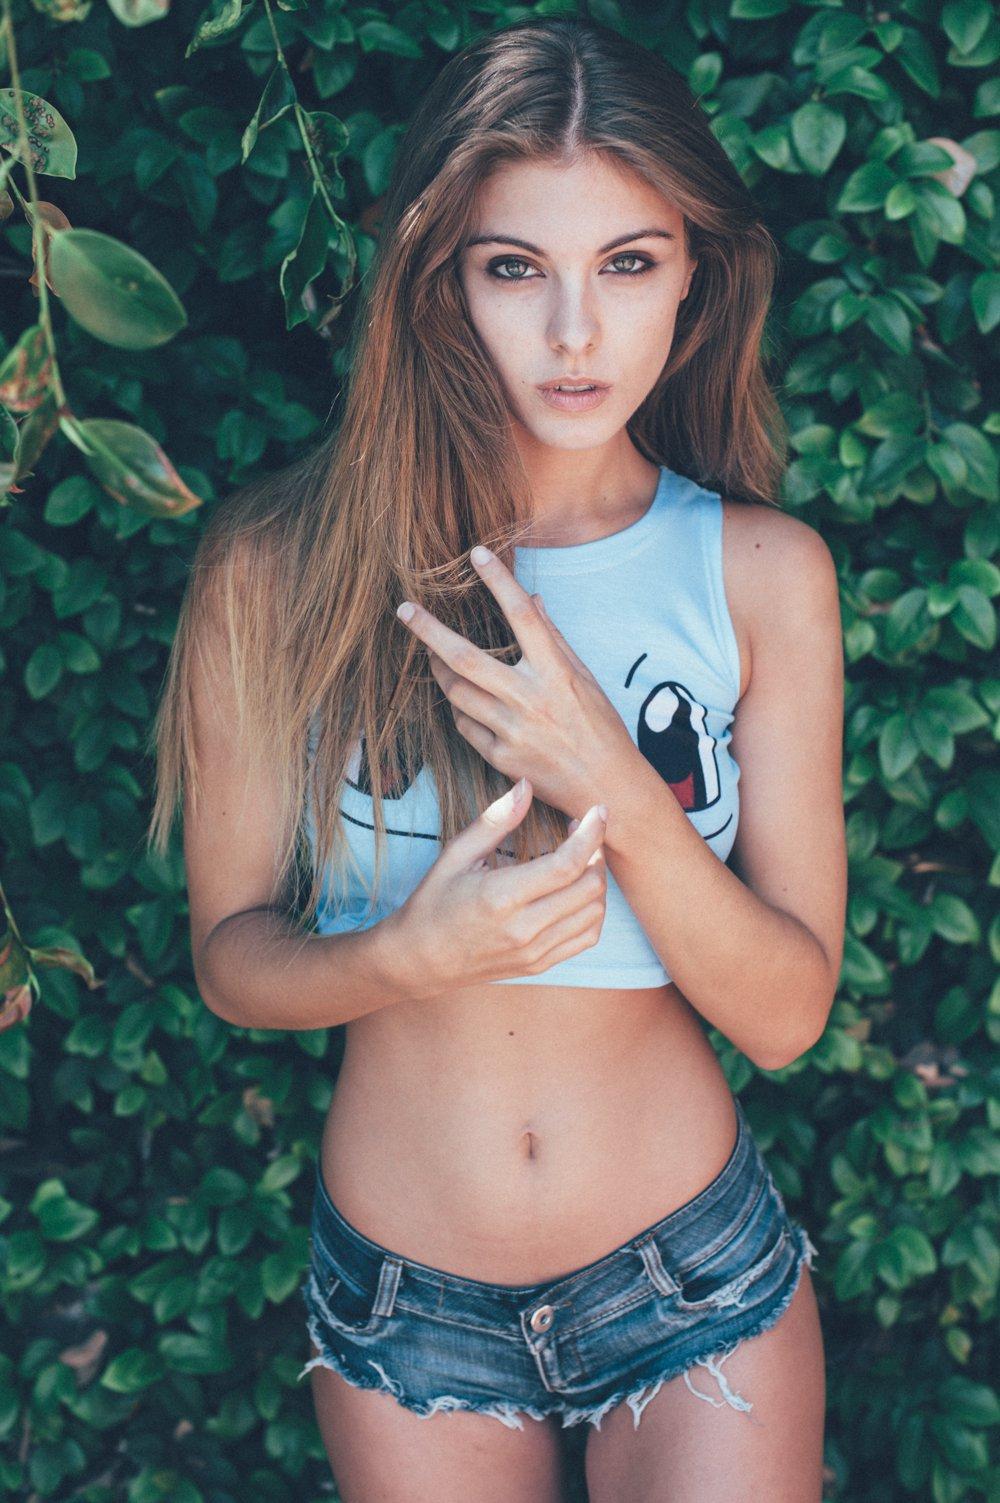 Snapchat Demi Rose Mawby naked (35 photo), Pussy, Cleavage, Selfie, in bikini 2015